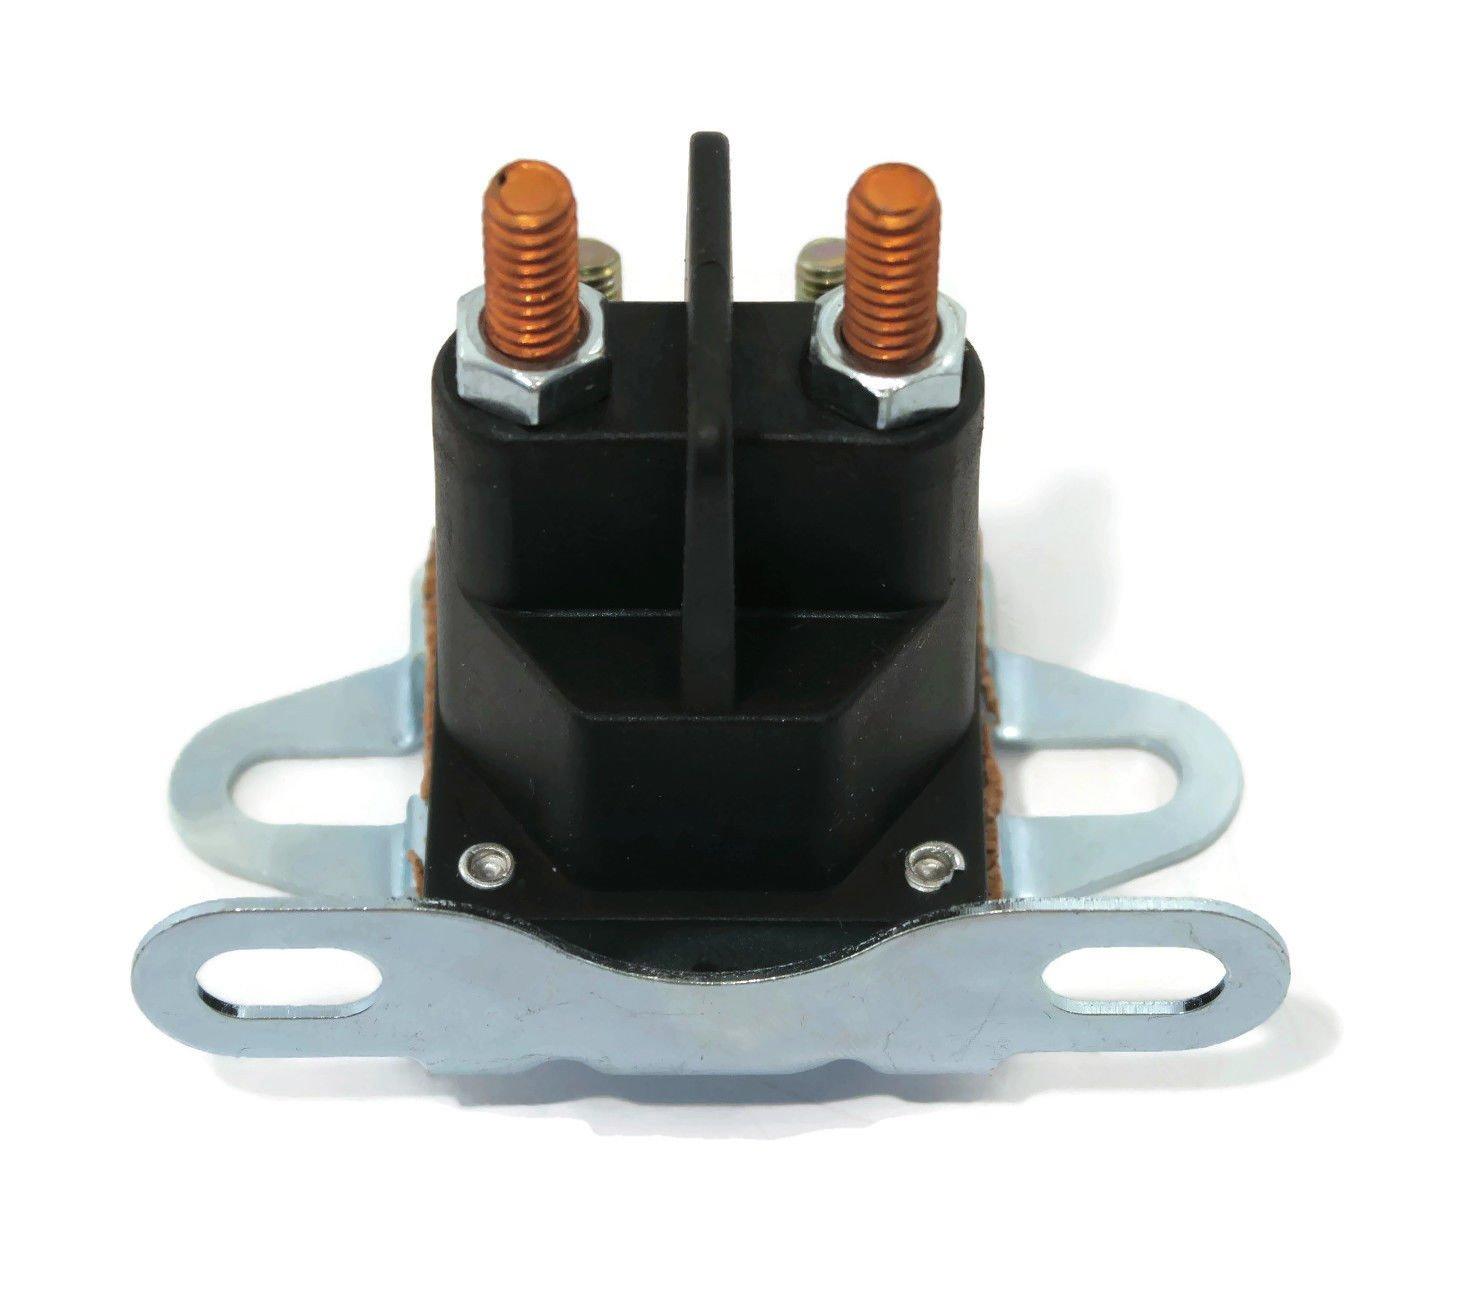 The Rop Shop Starter Solenoid Fits Exmark 42 Quest Ztr S Series 50 12 Volt Wiring Diagram Toro Ss5000 E Zero Turn Mower Industrial Scientific